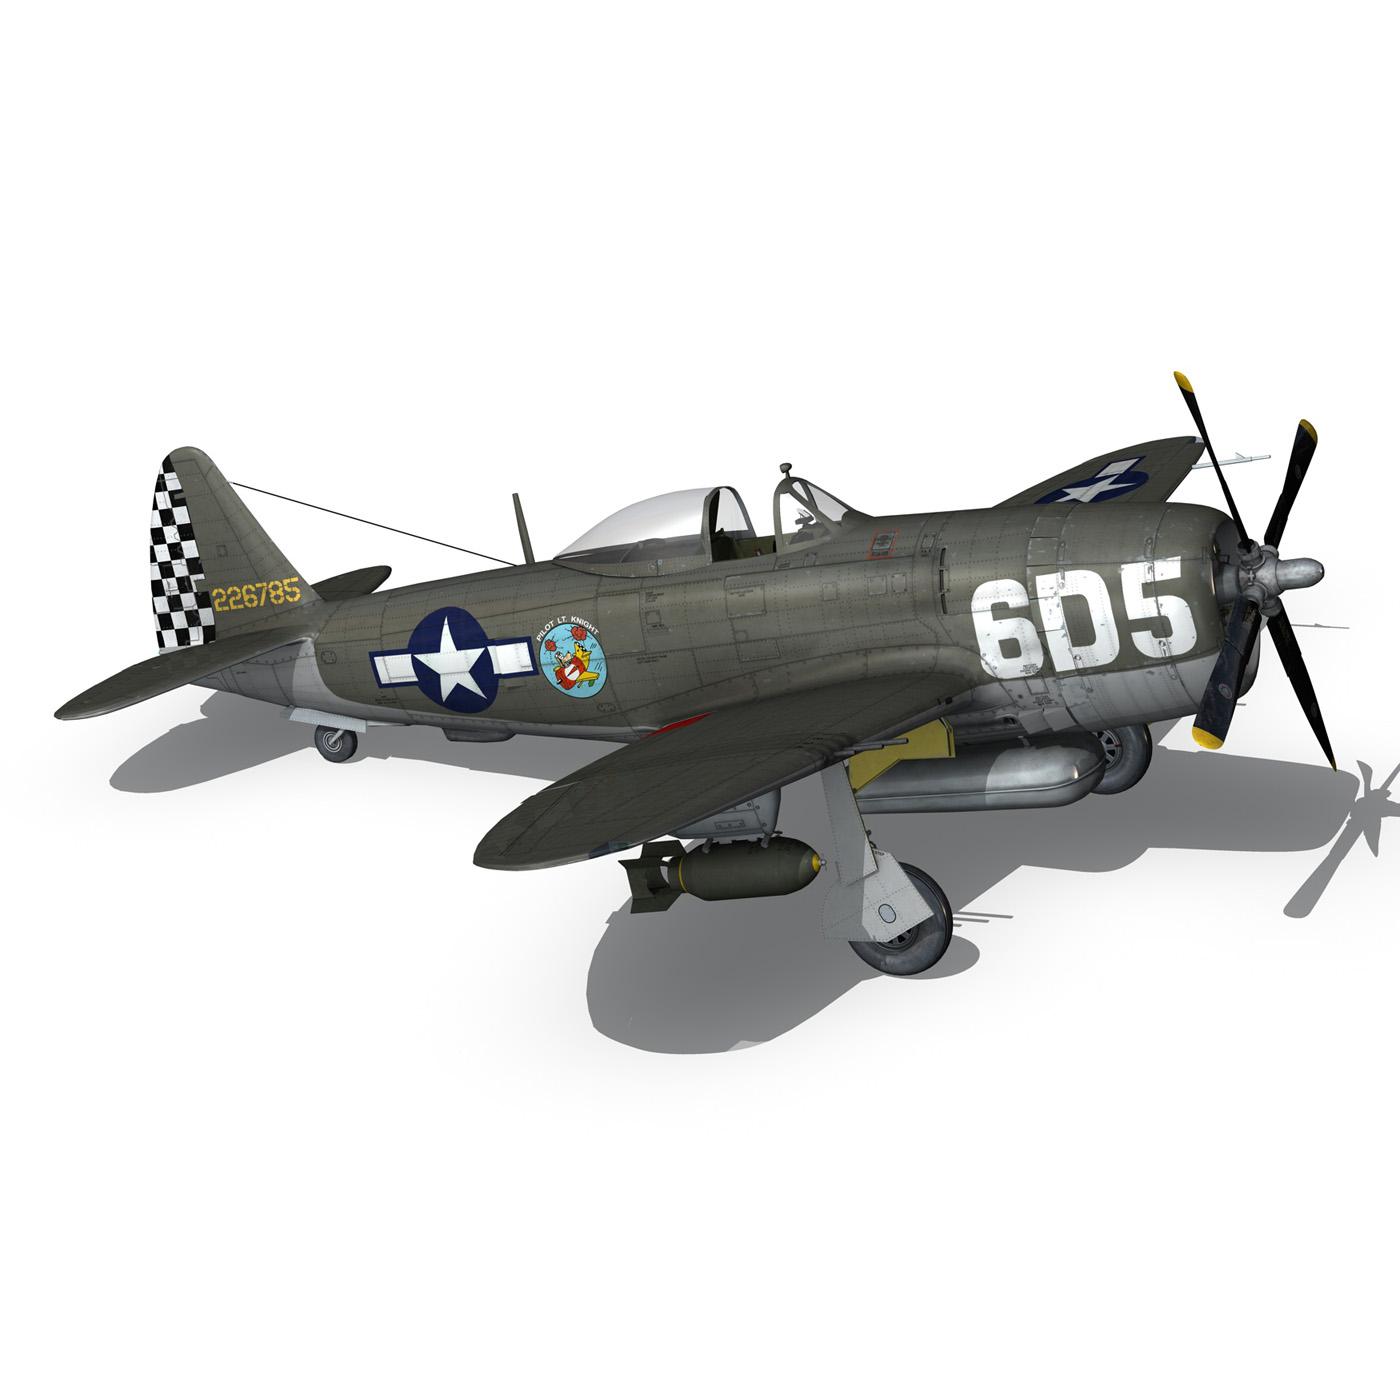 republic p-47 thunderbolt – oh johnnie 3d model fbx c4d lwo obj 274259